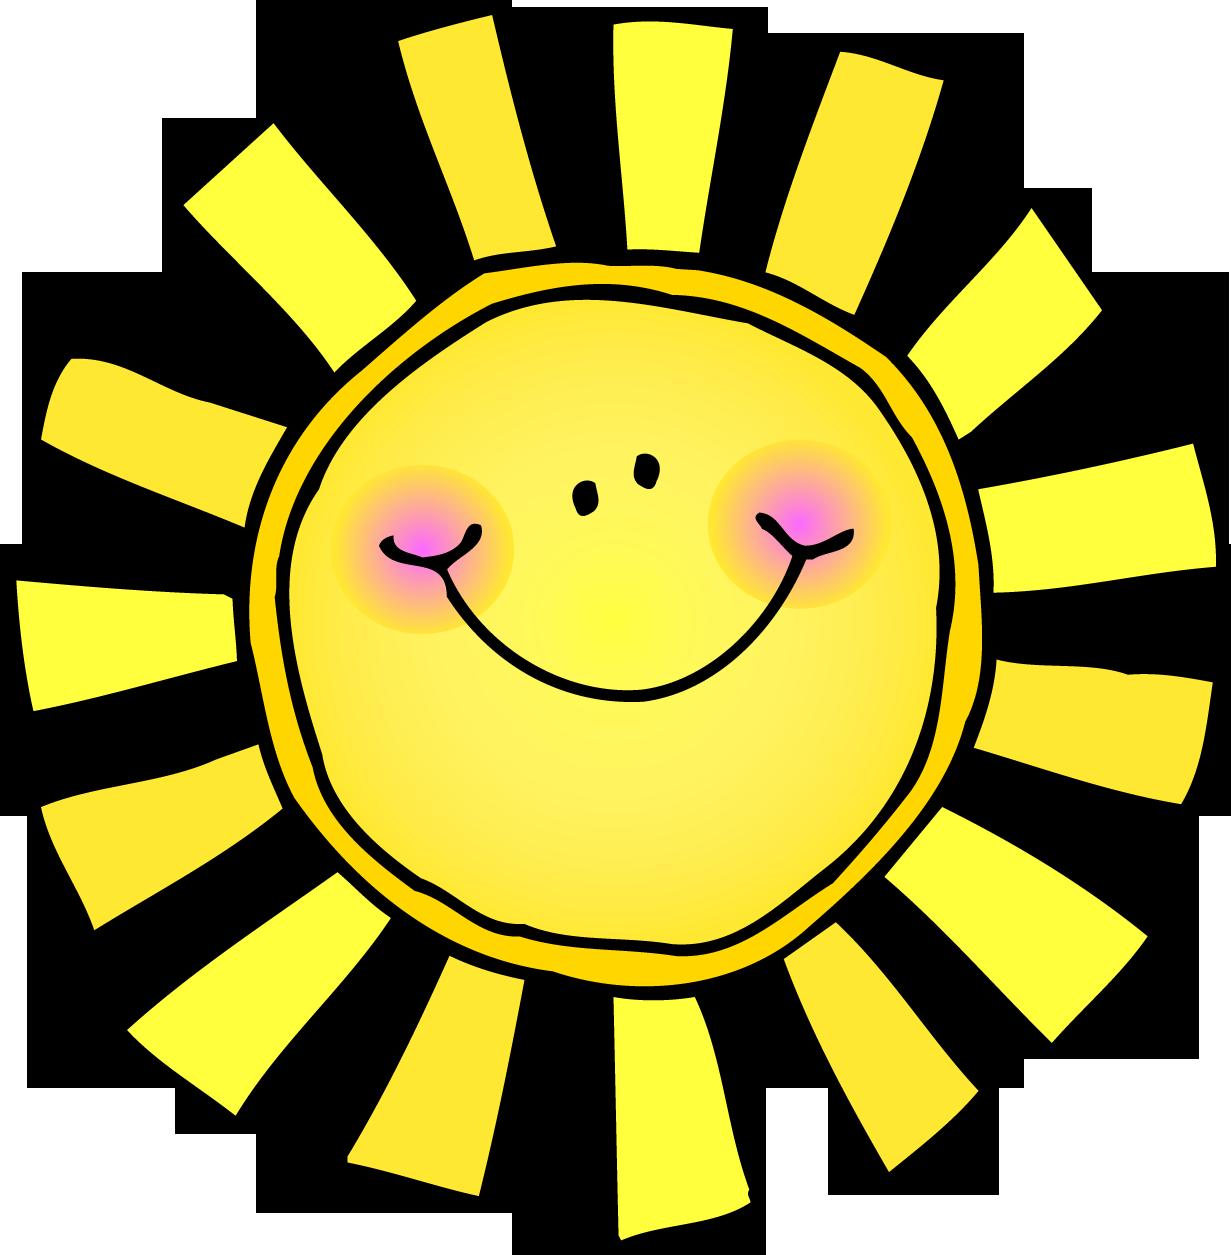 Happy Face Clipart For Teachers.